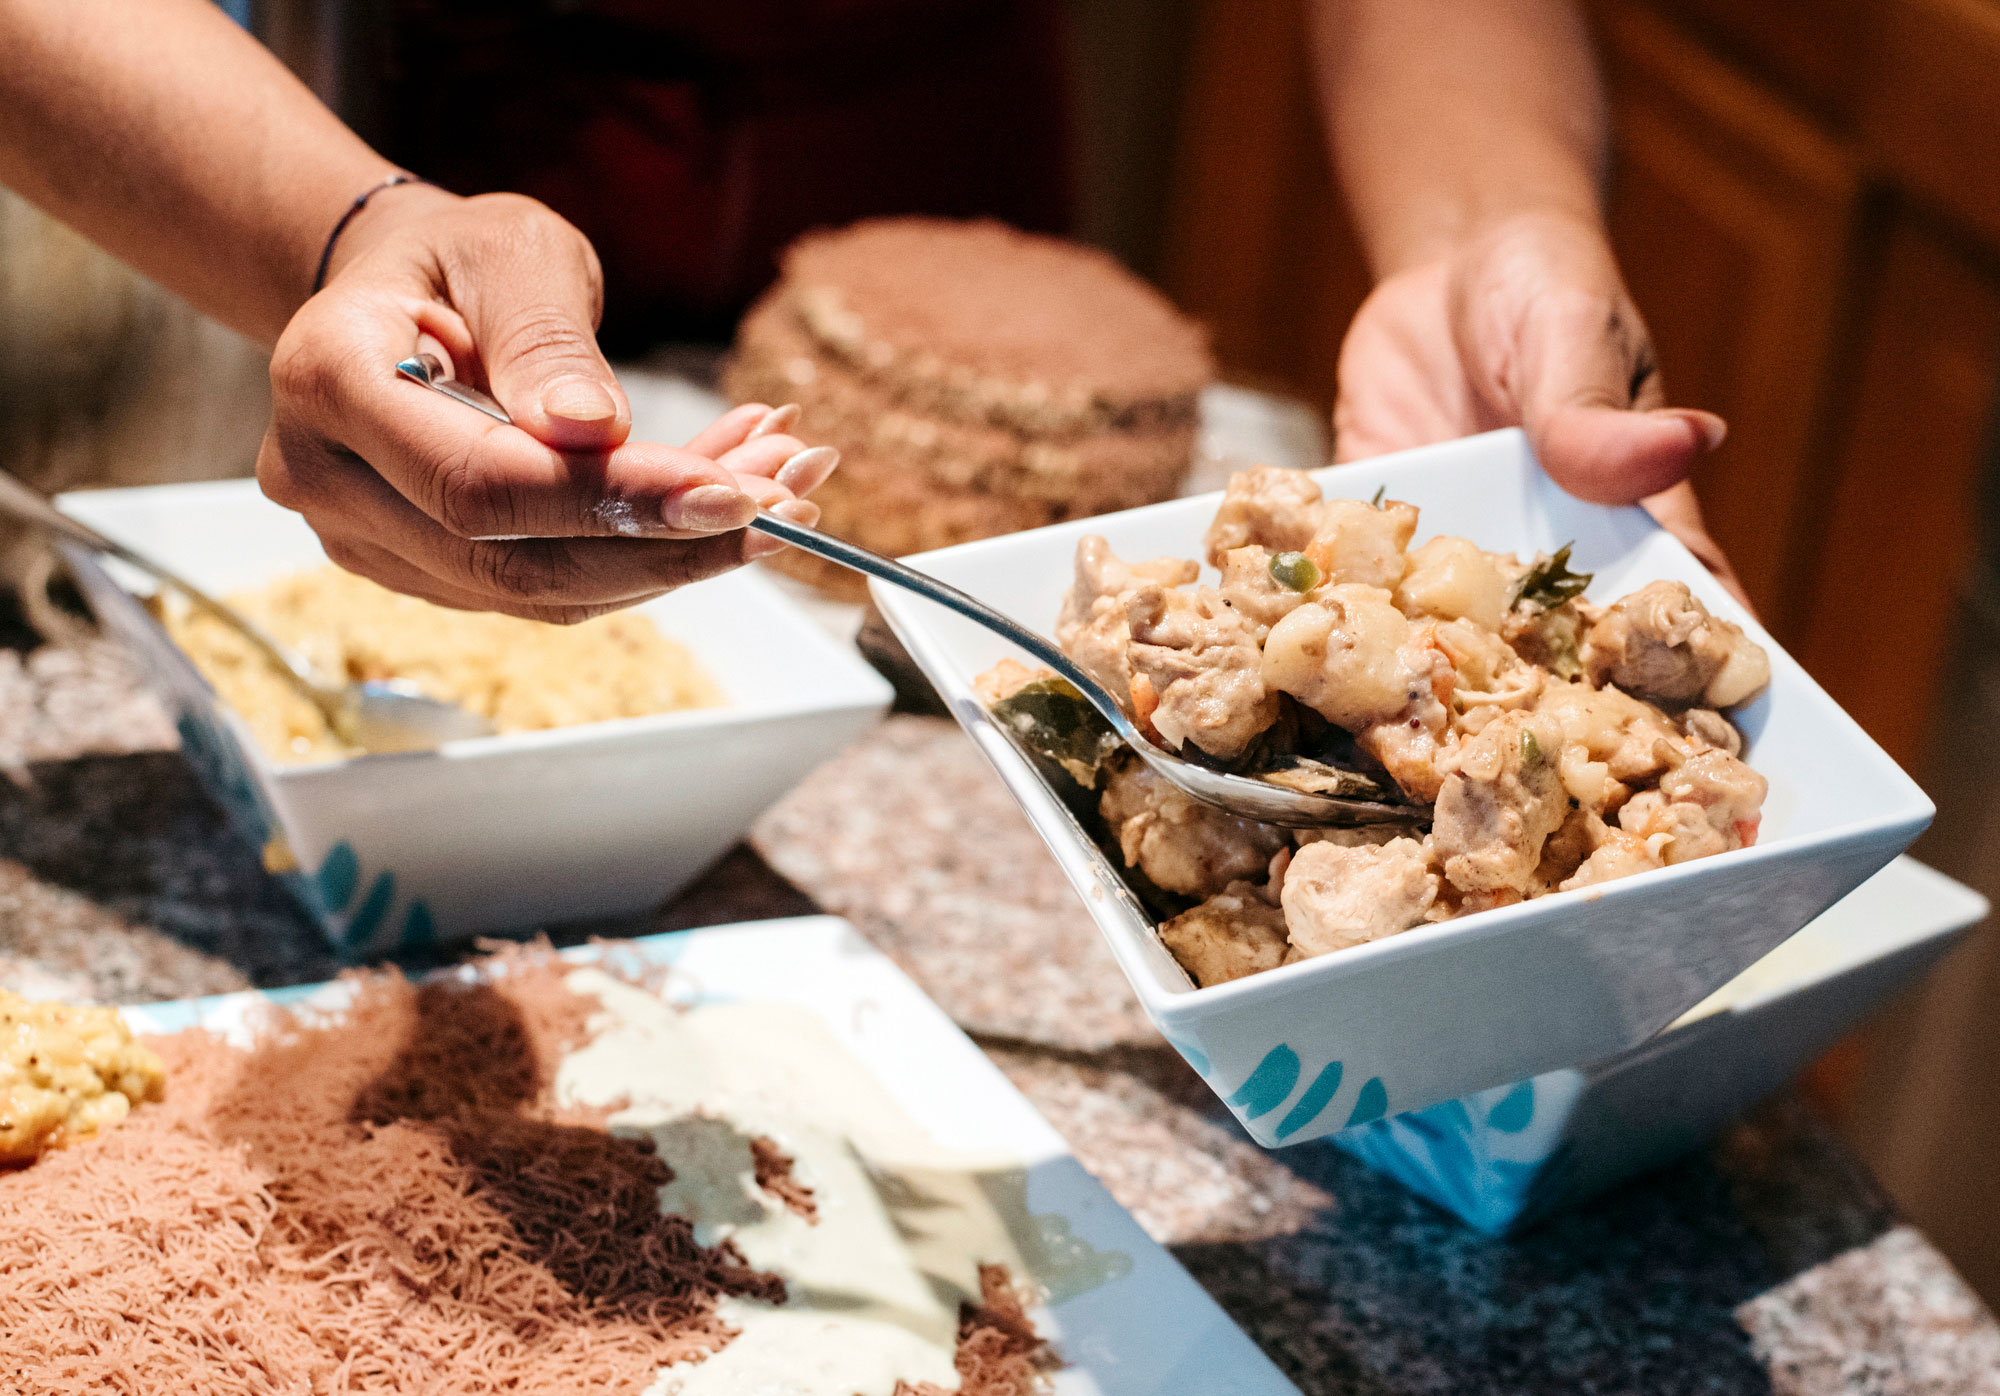 Los_Angeles_Food_photographer_Rebecca_Peloquin_Sri_Lankan_Food_023.JPG